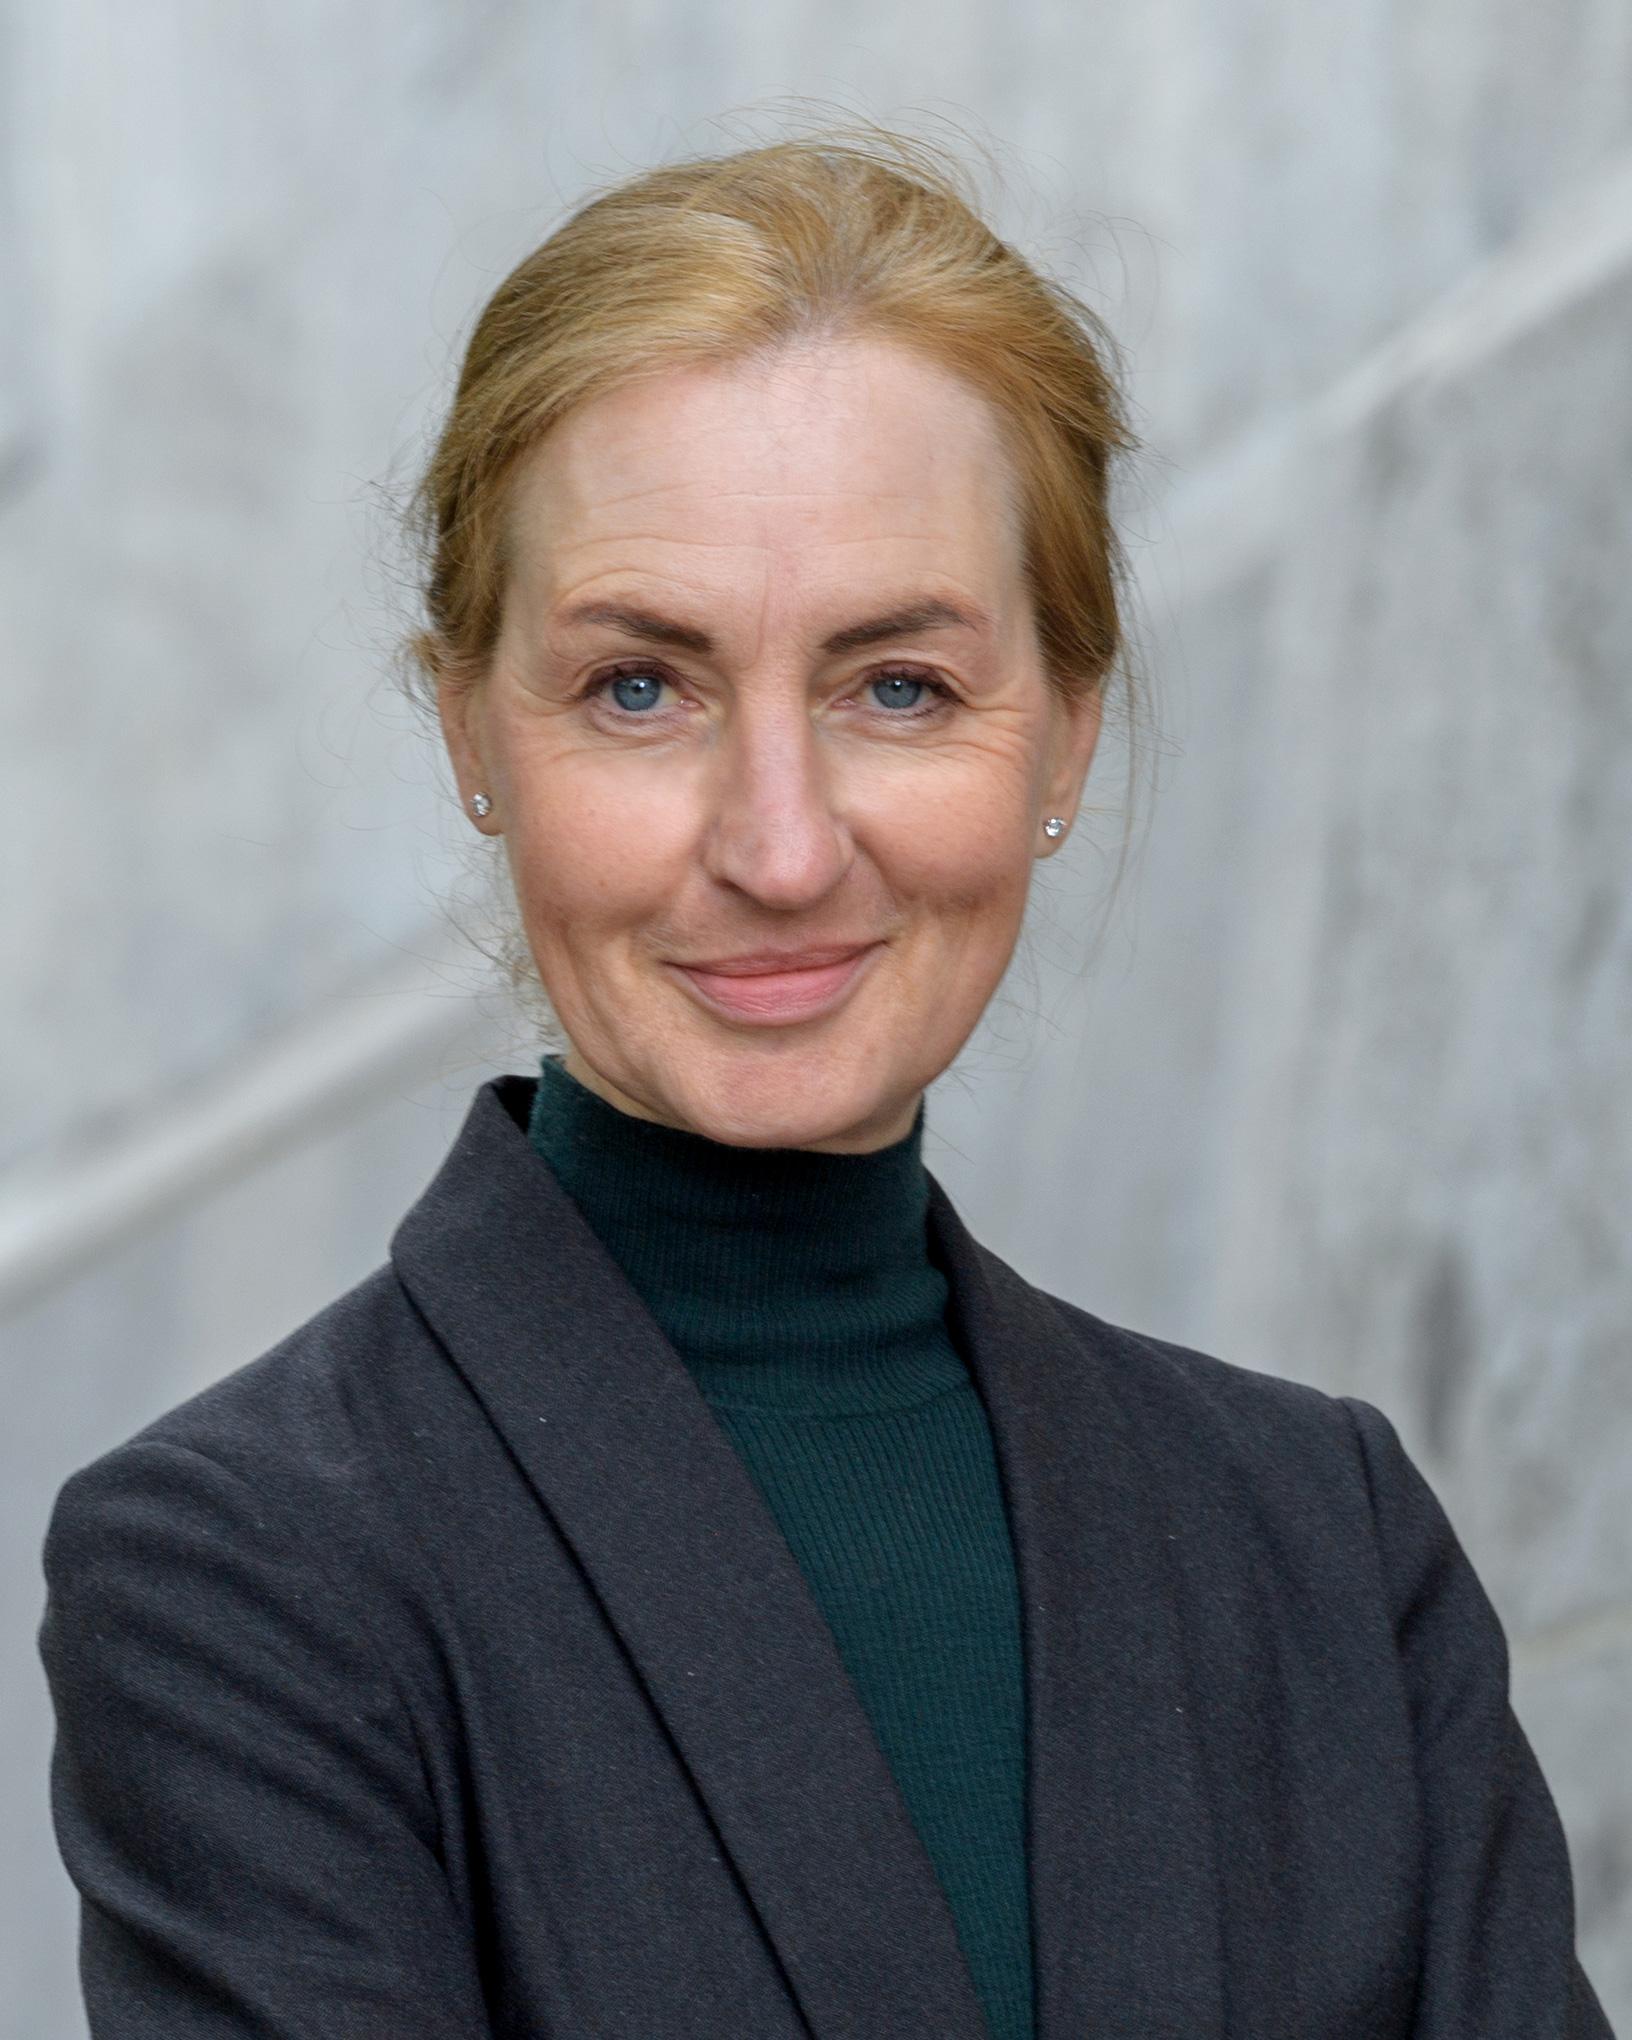 Bettina Mutter – Mutter & Partner Consulting AG, Bern – politische und strategische Beratung